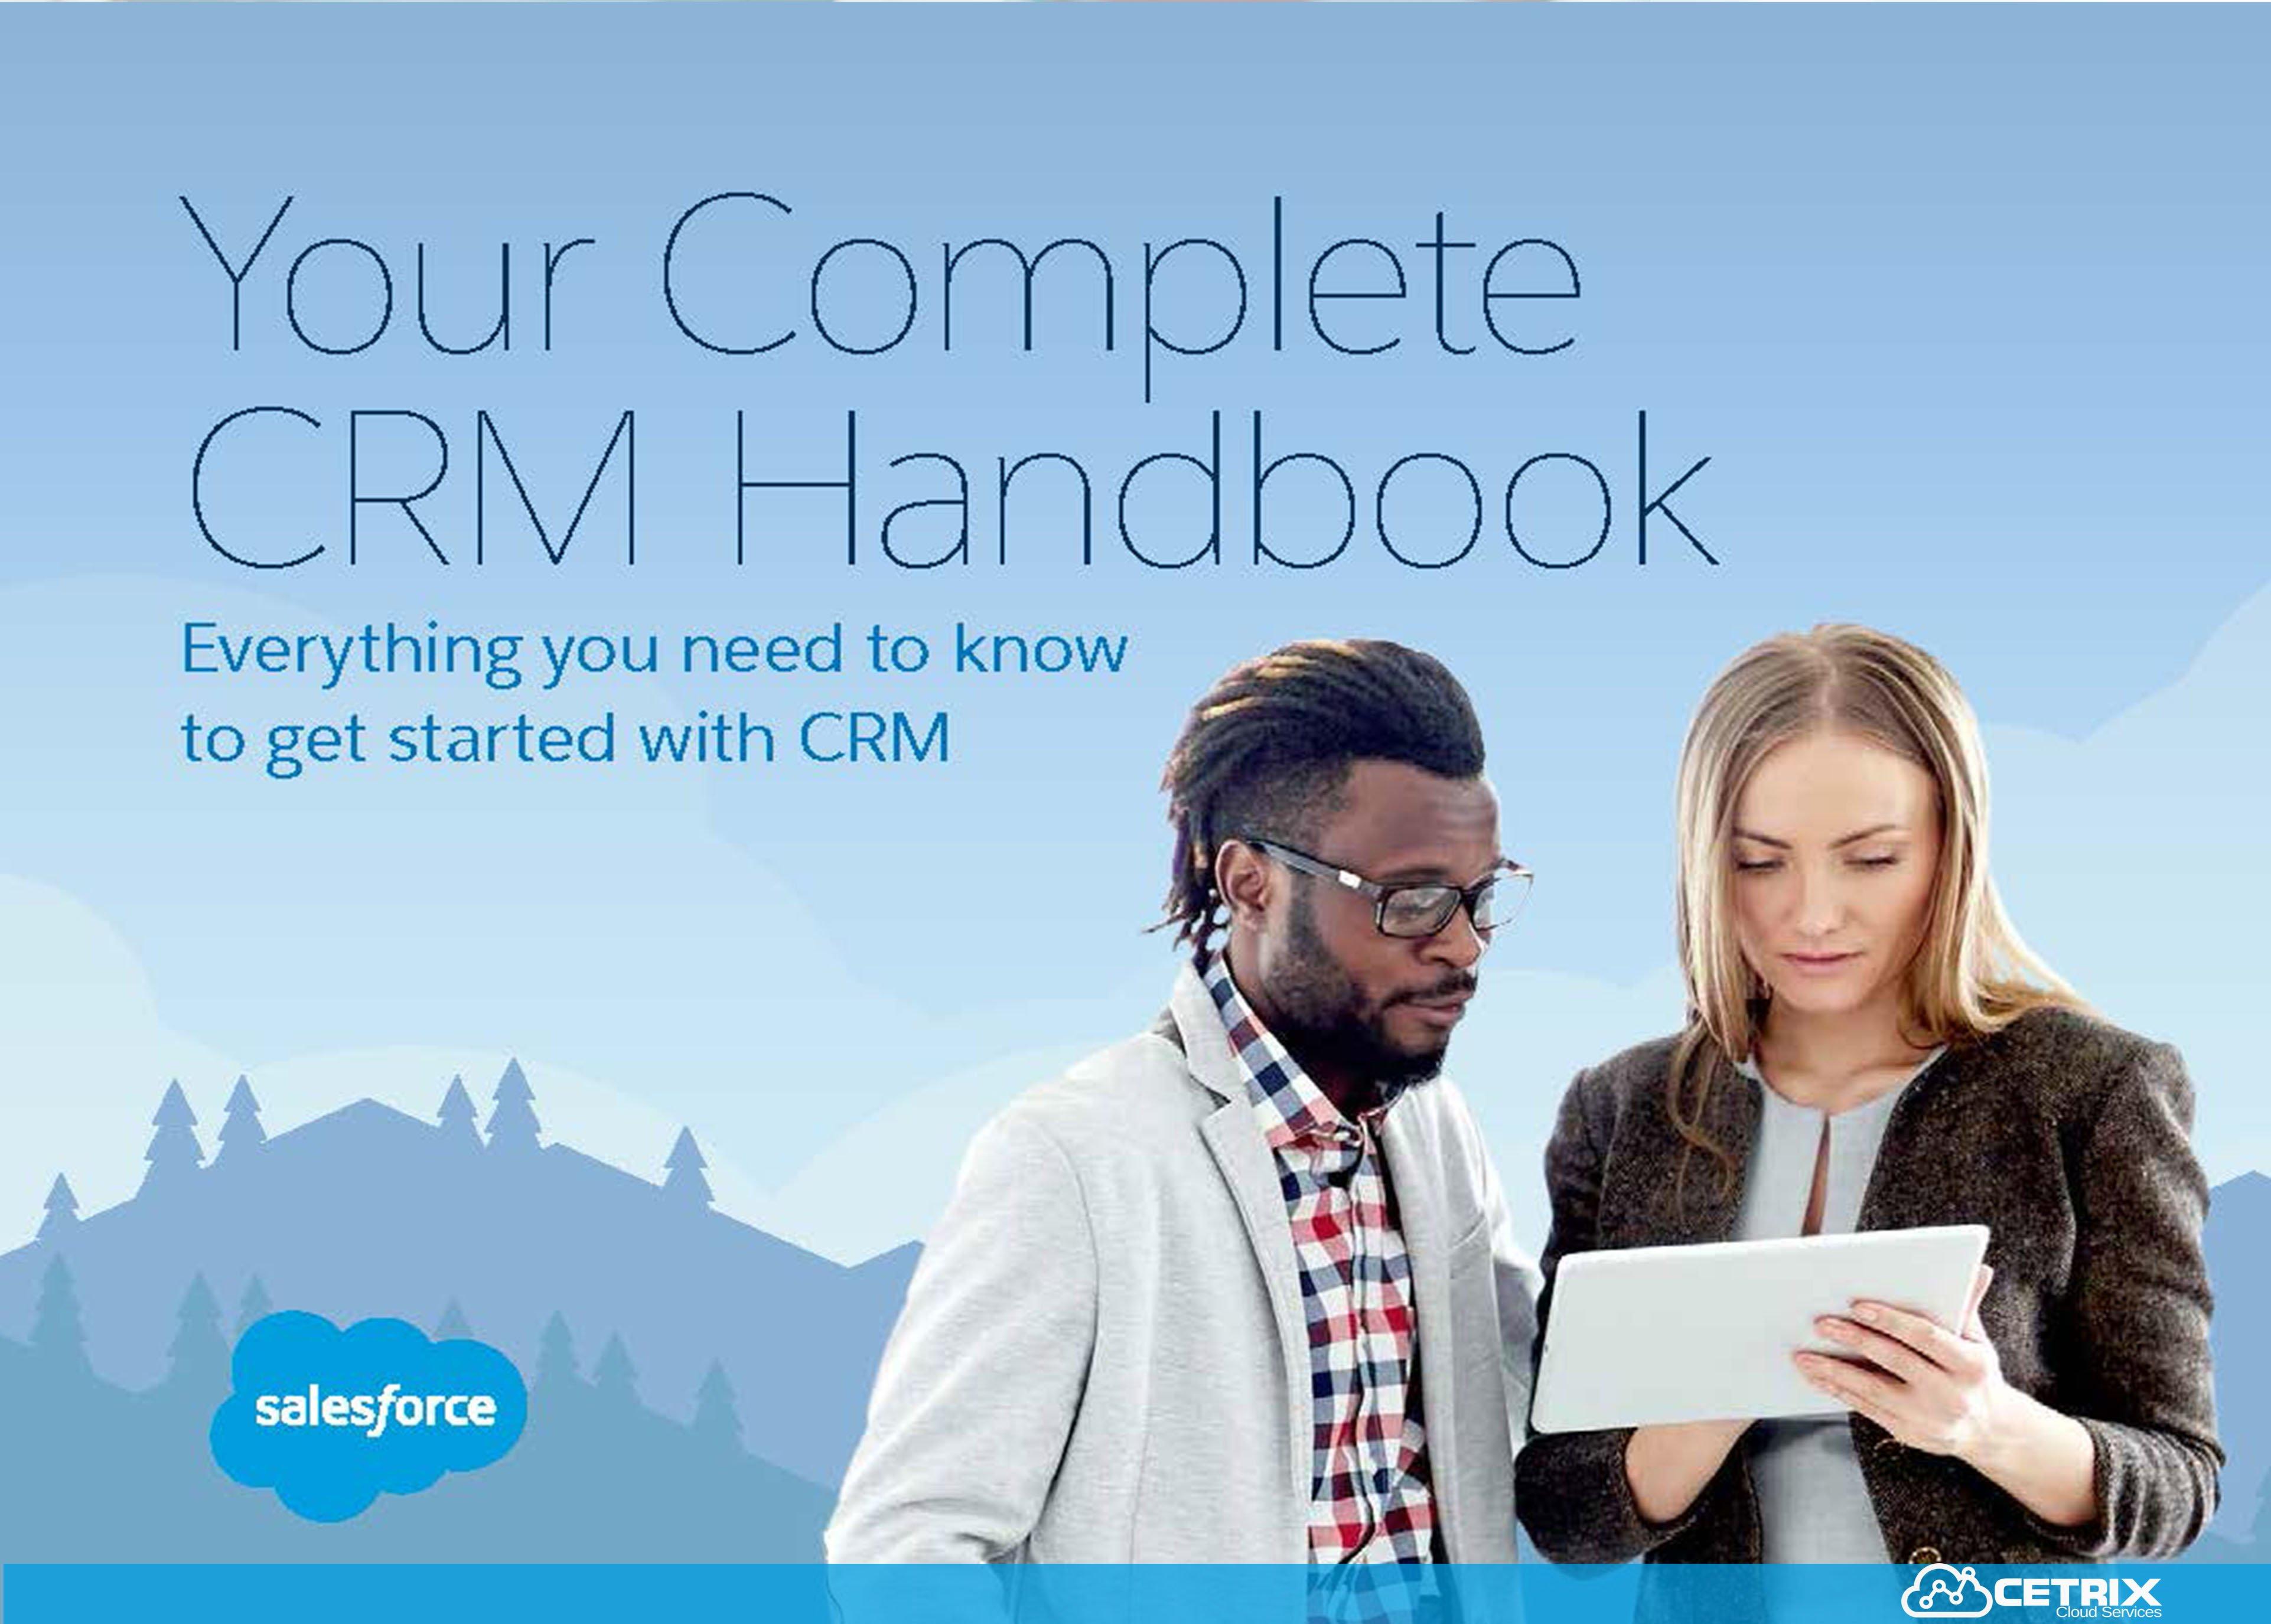 SFDC_Complete_CRM_Handbook